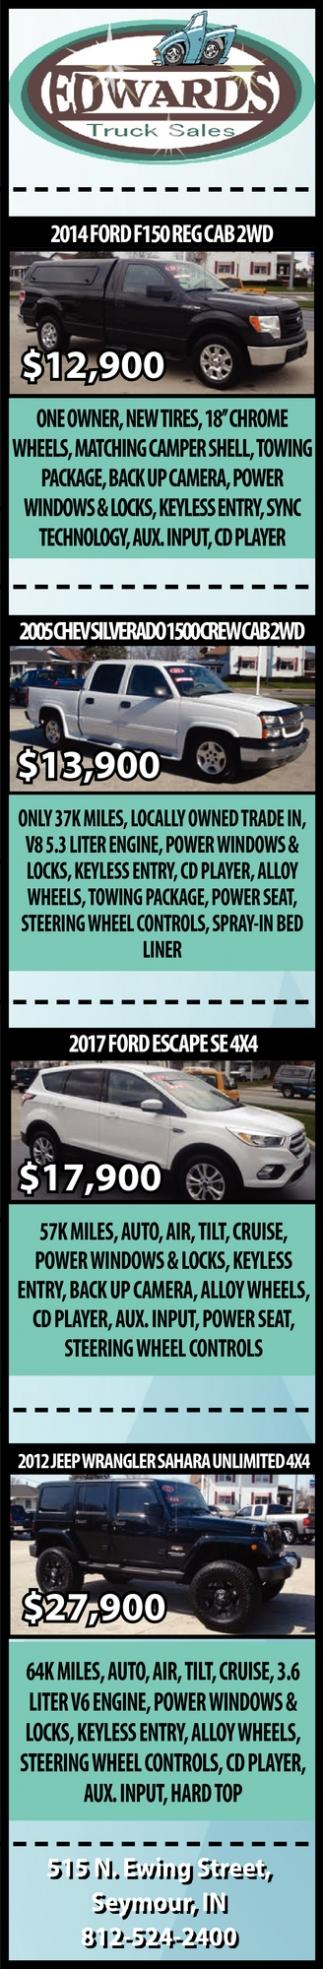 2014 Ford F150 REG CAB 2WD